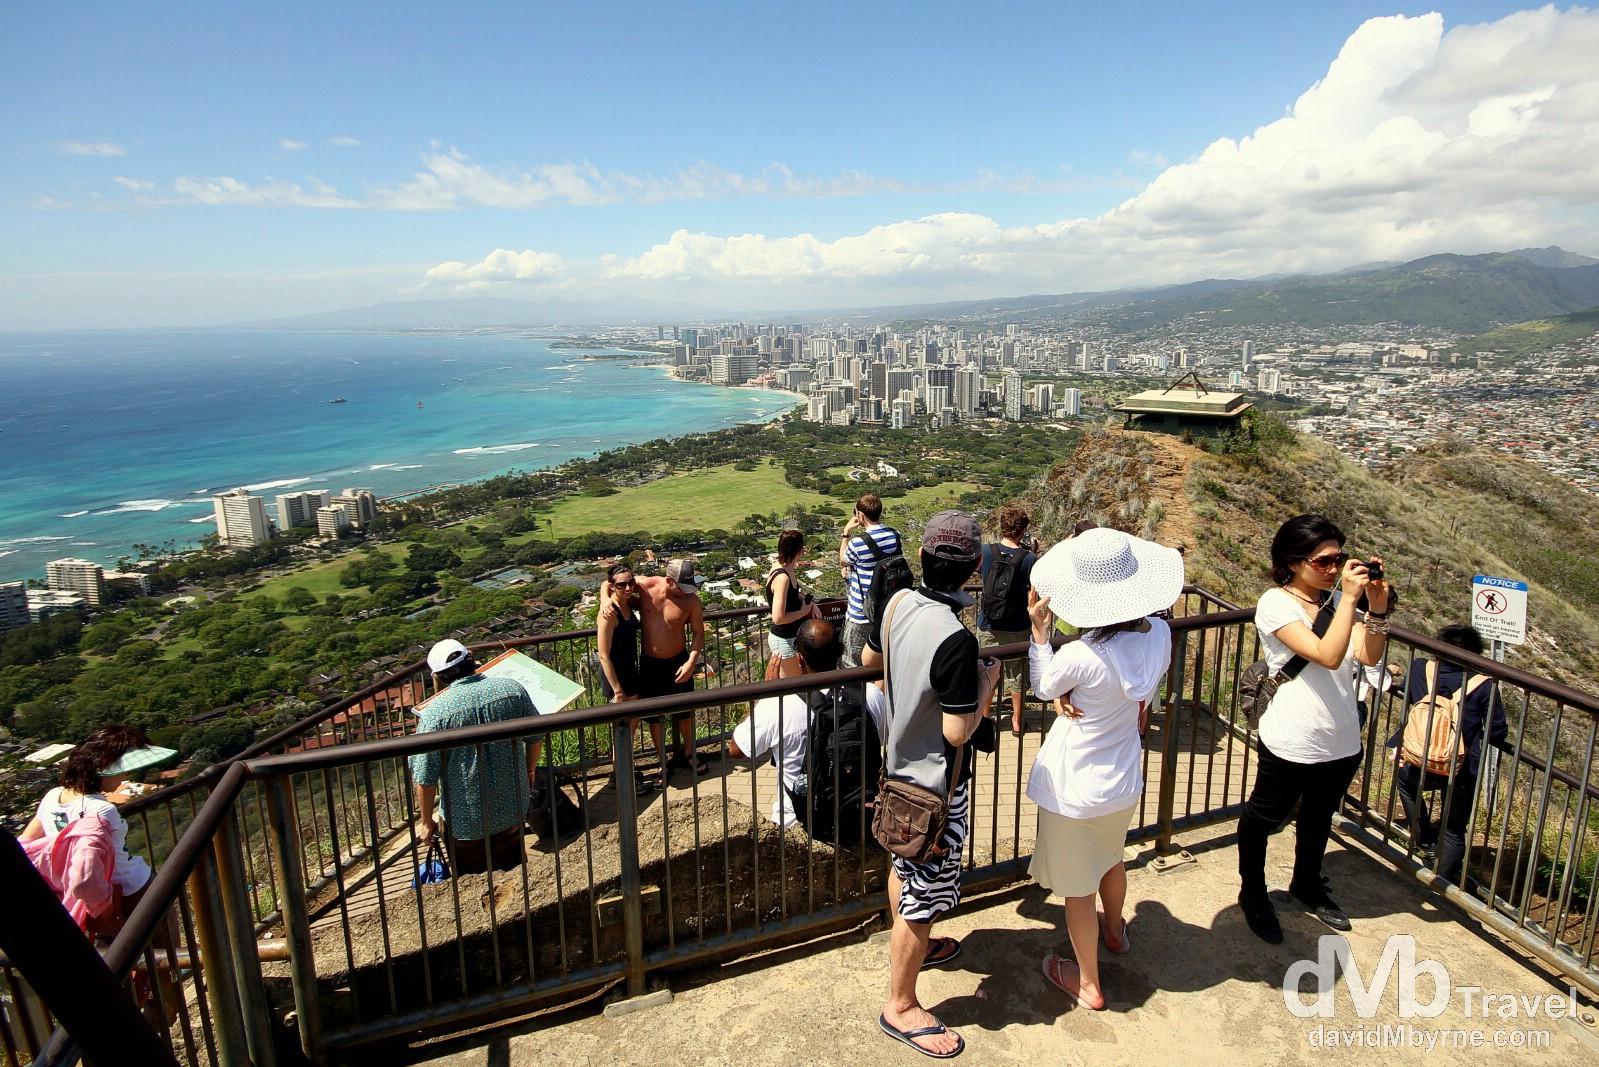 Atop Diamond Head, Oahu, Hawaii, USA. March 11th 2013.